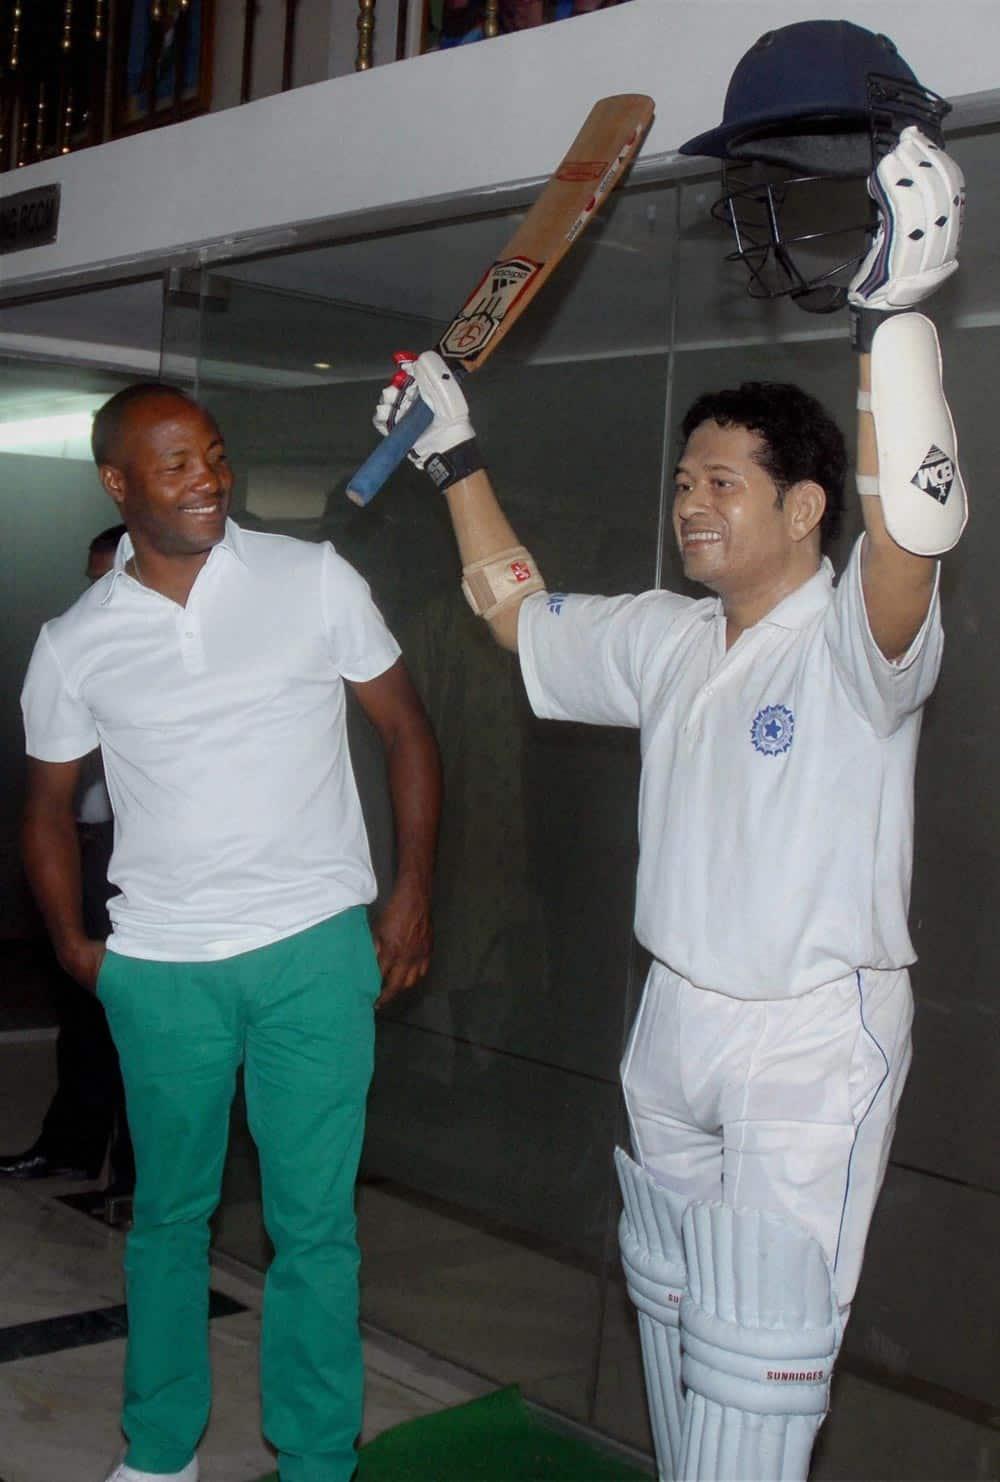 Former West Indian cricketer Brian Lara looking at the wax statue of Master Blaster Sachin Tendulkar at Eden Gardens in Kolkata.